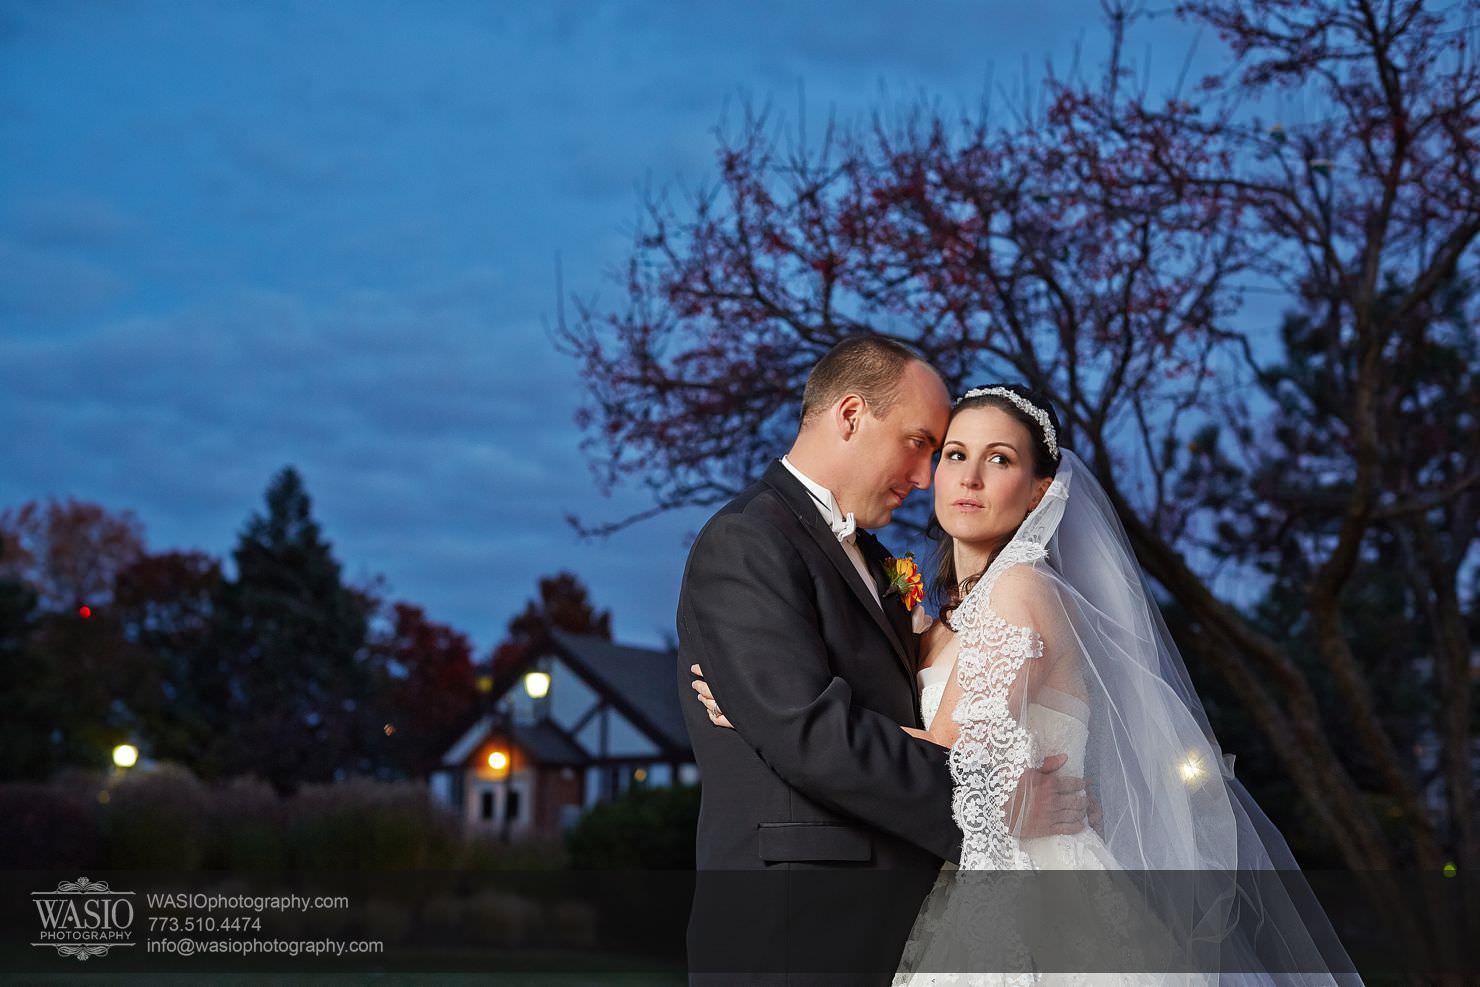 Rosemont-Fall-Wedding-Lauren-and-David-021 Rosemont Fall Wedding - Lauren + David